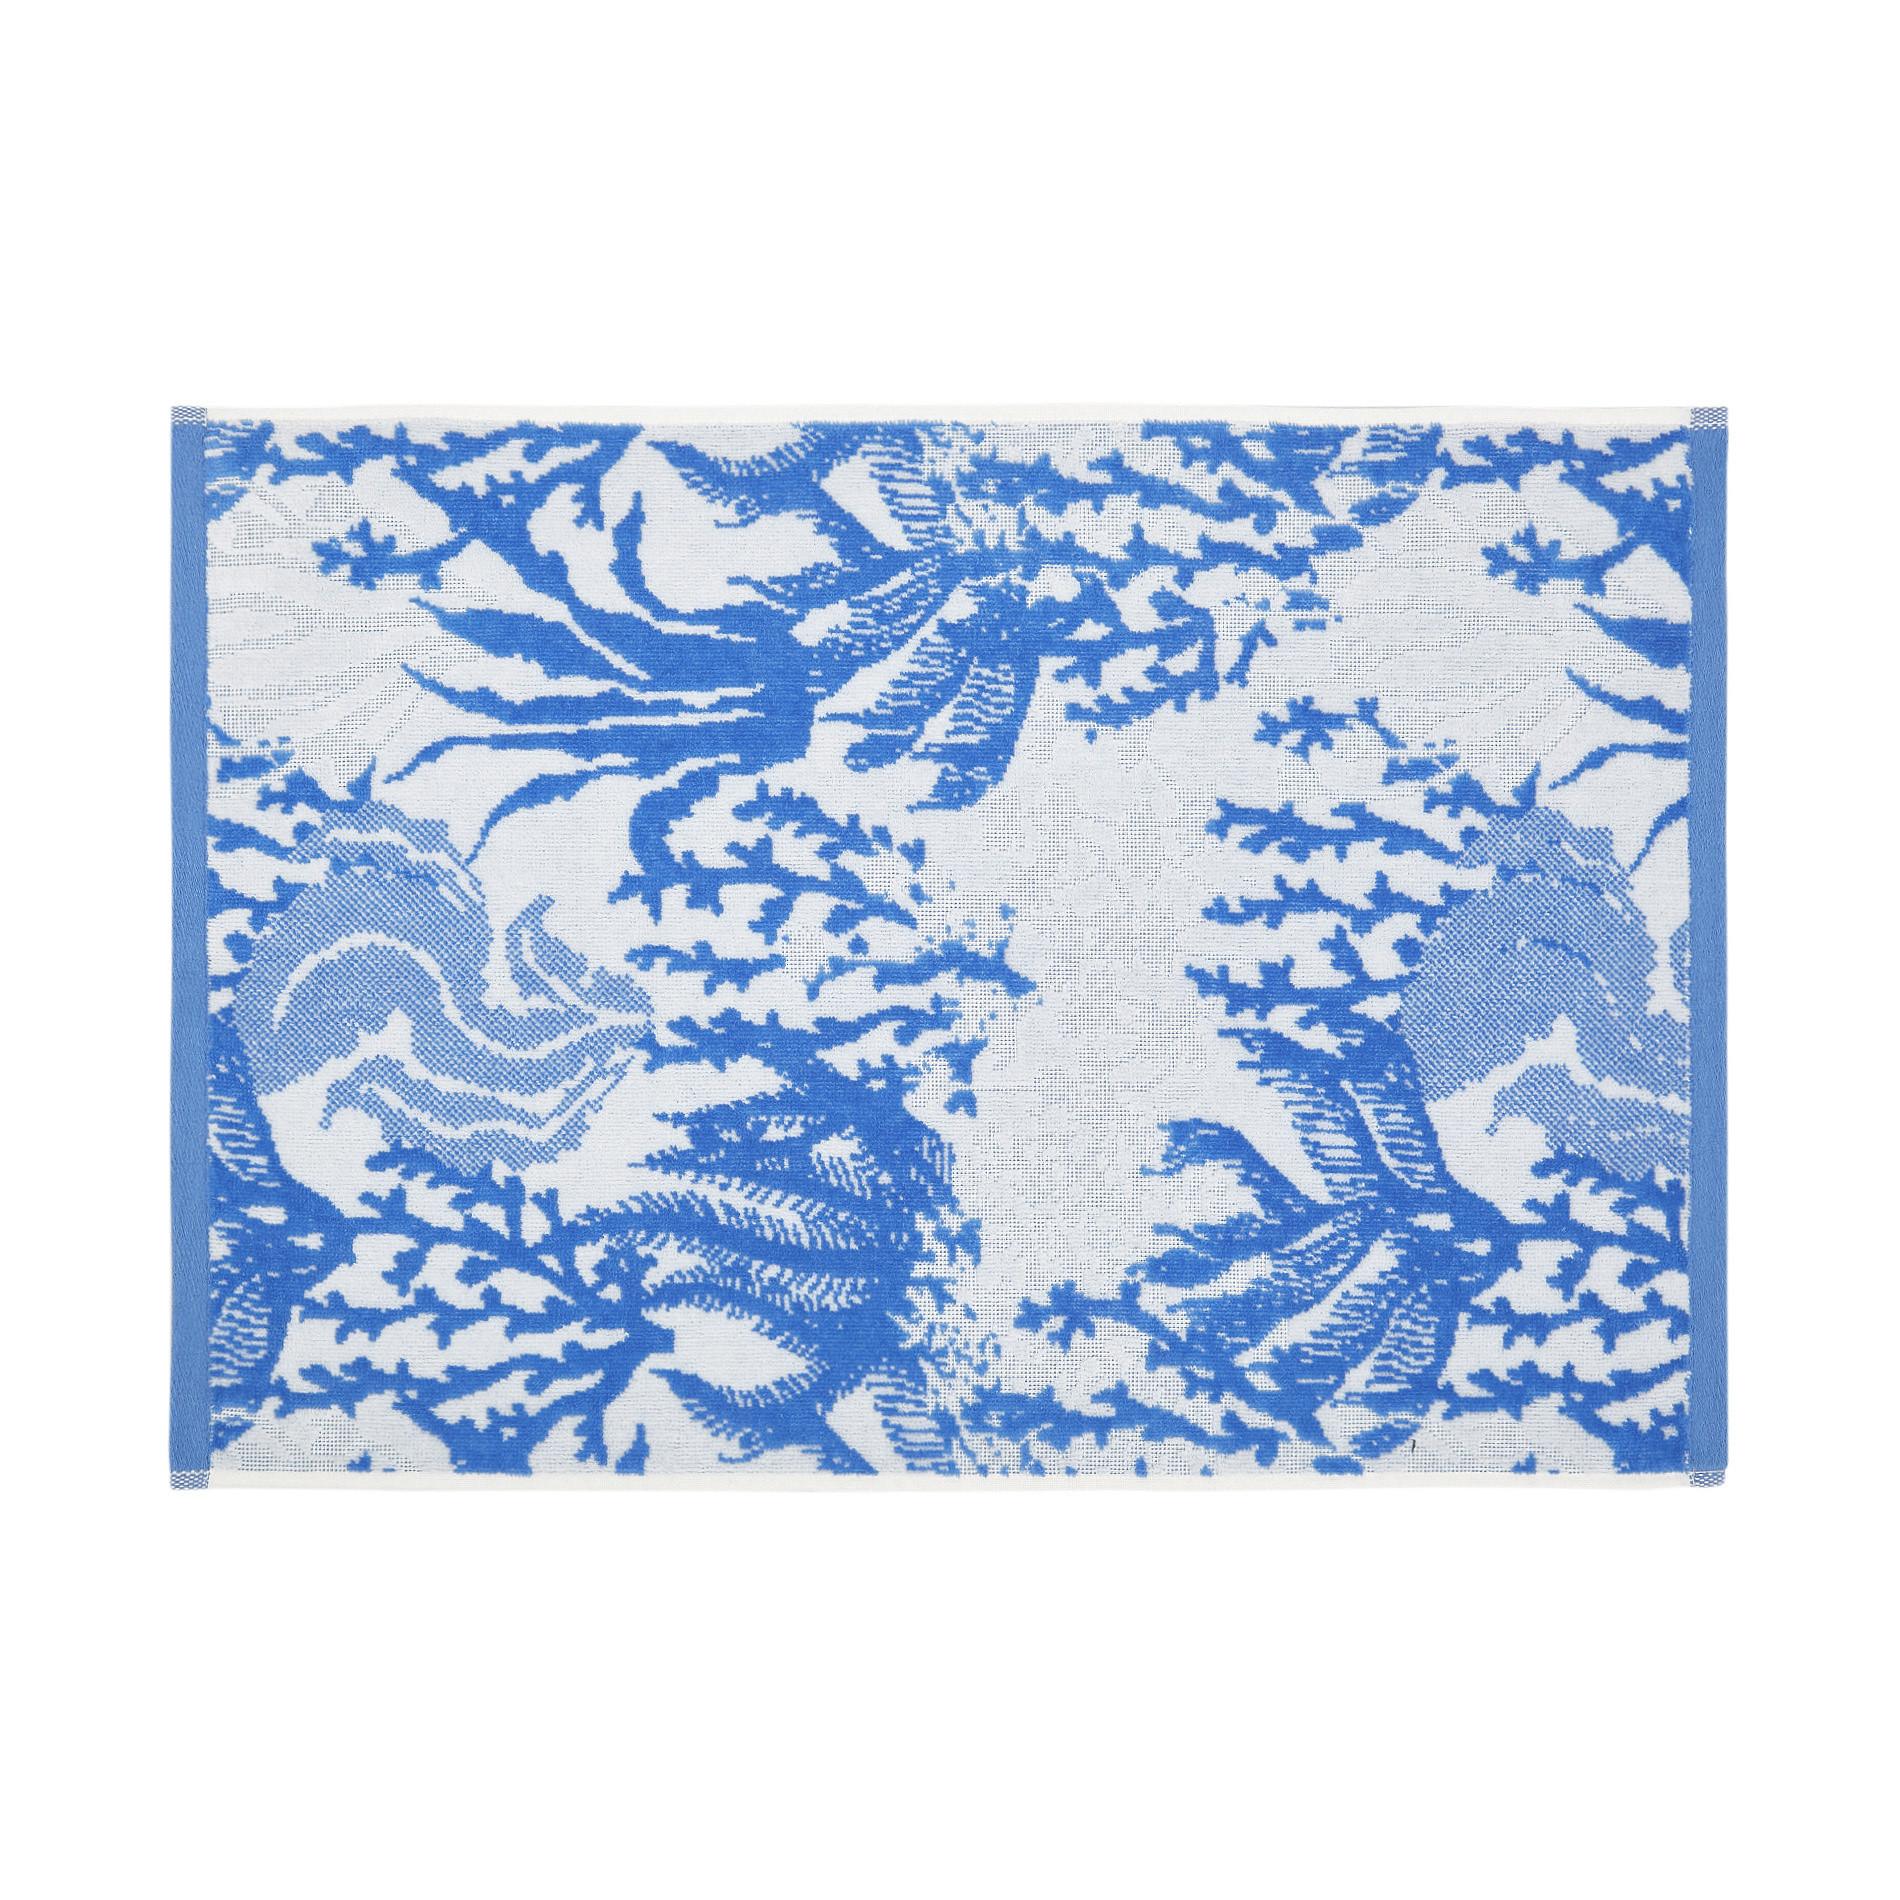 Asciugamano cotone velour motivo coralli, Blu, large image number 1